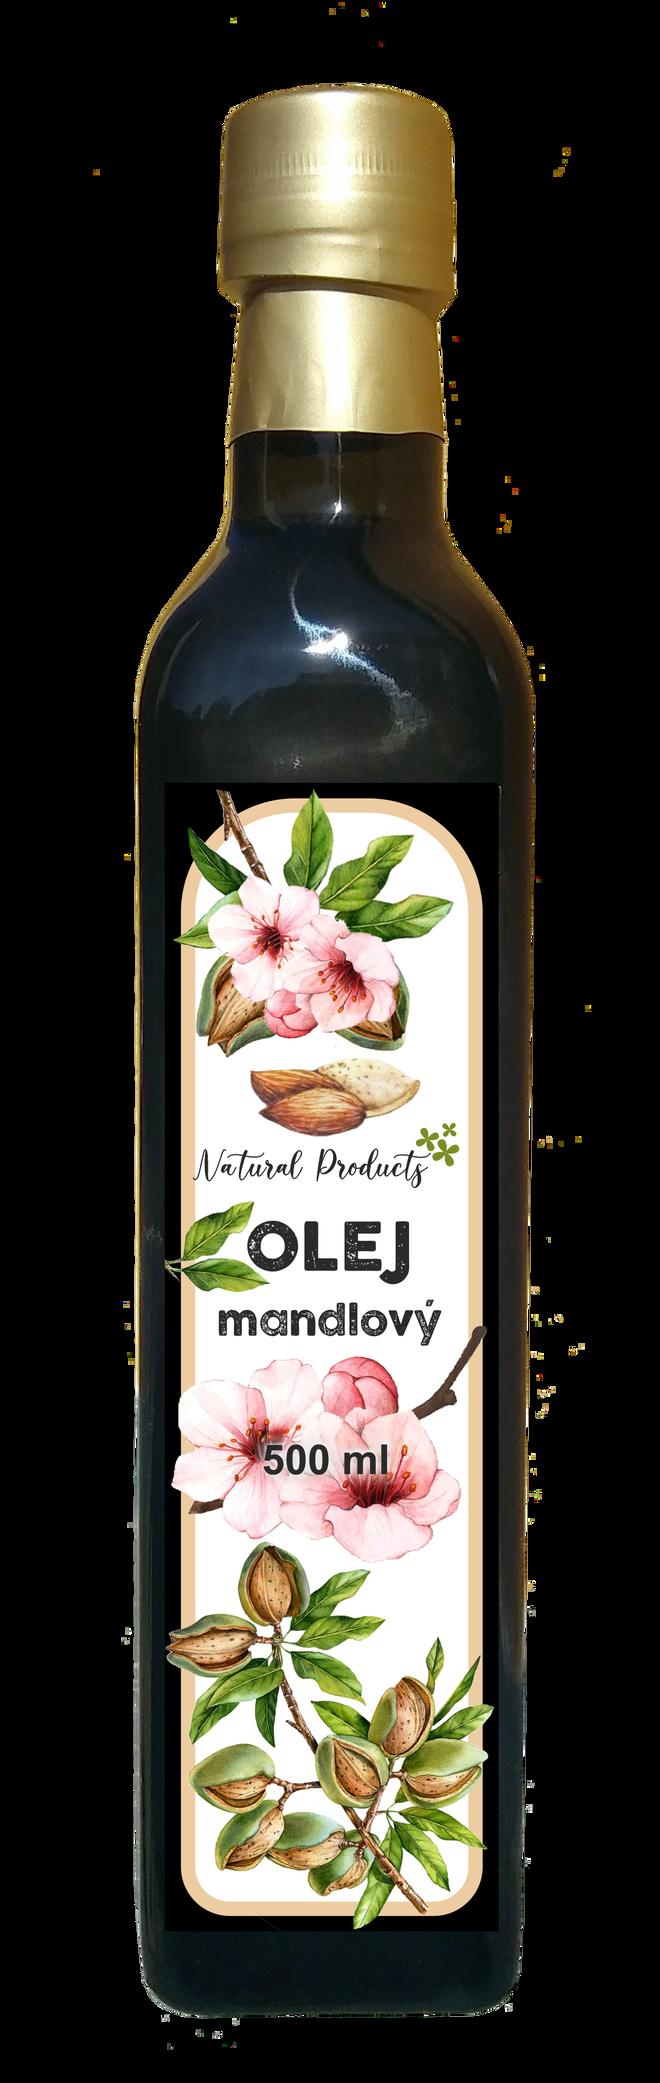 Mandlový olej, 500 ml